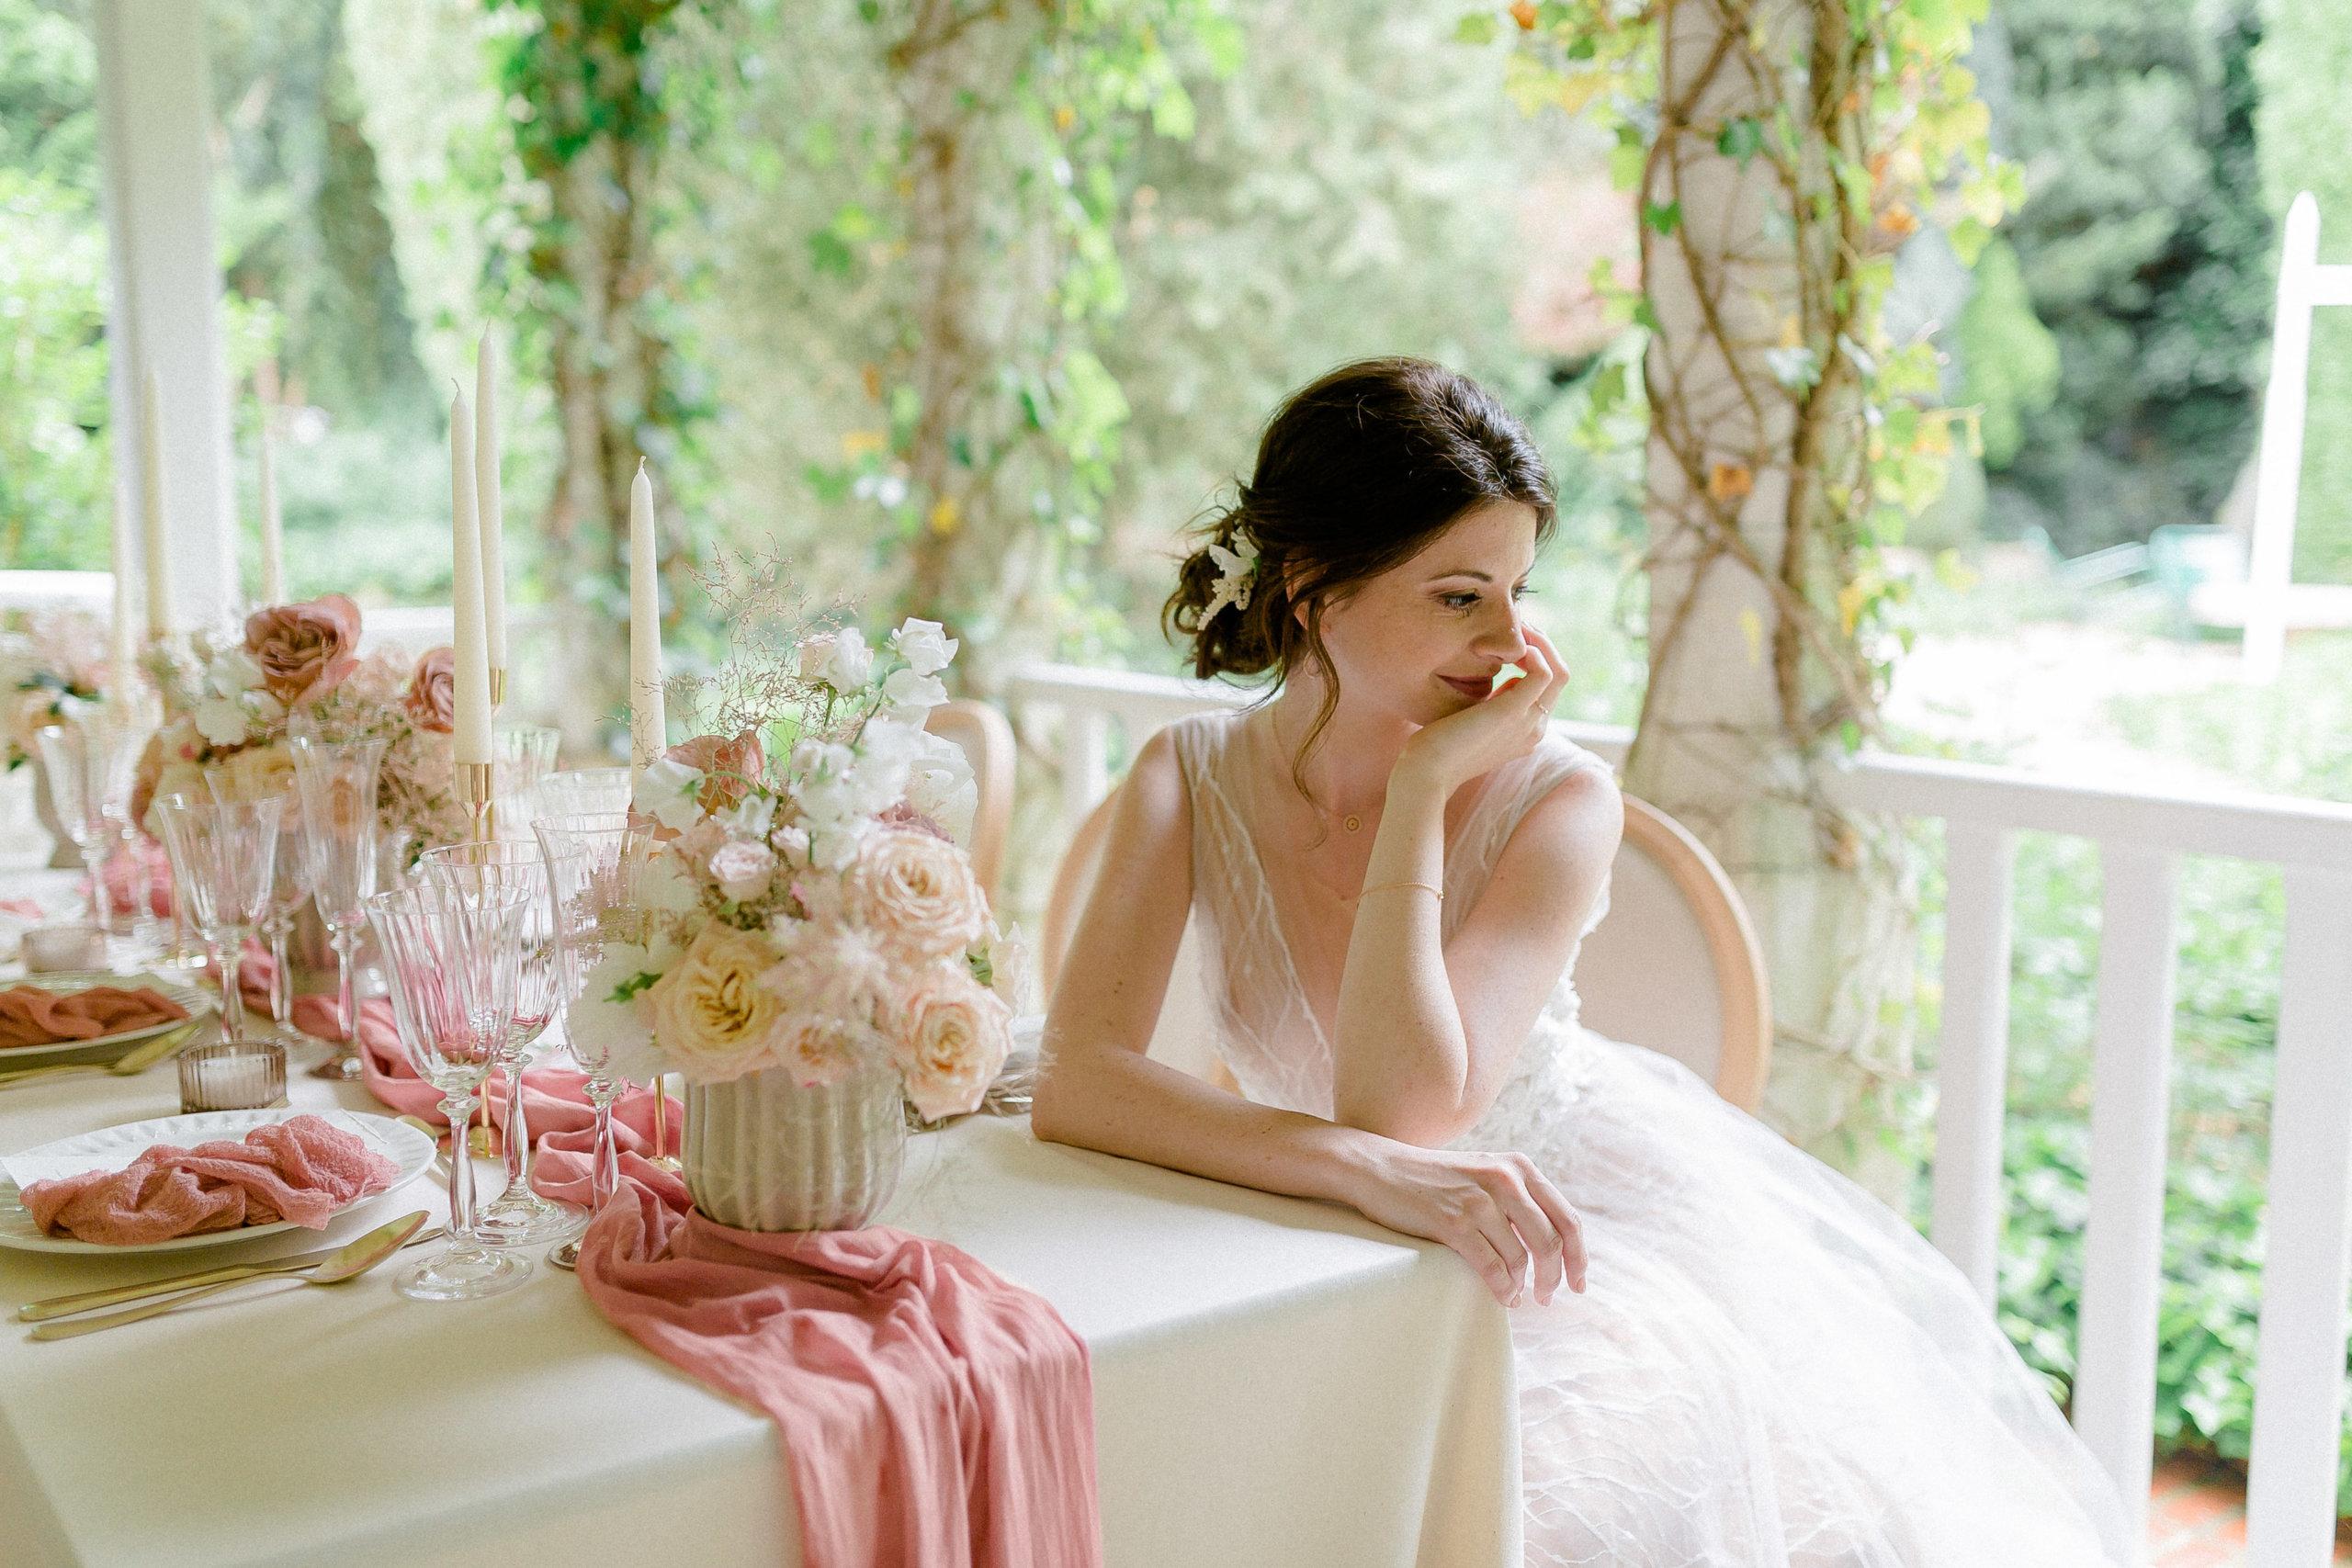 la-mariée-a-la-rencontre-de-son-pere-pour-l'accompagner-a-son-futur-mari